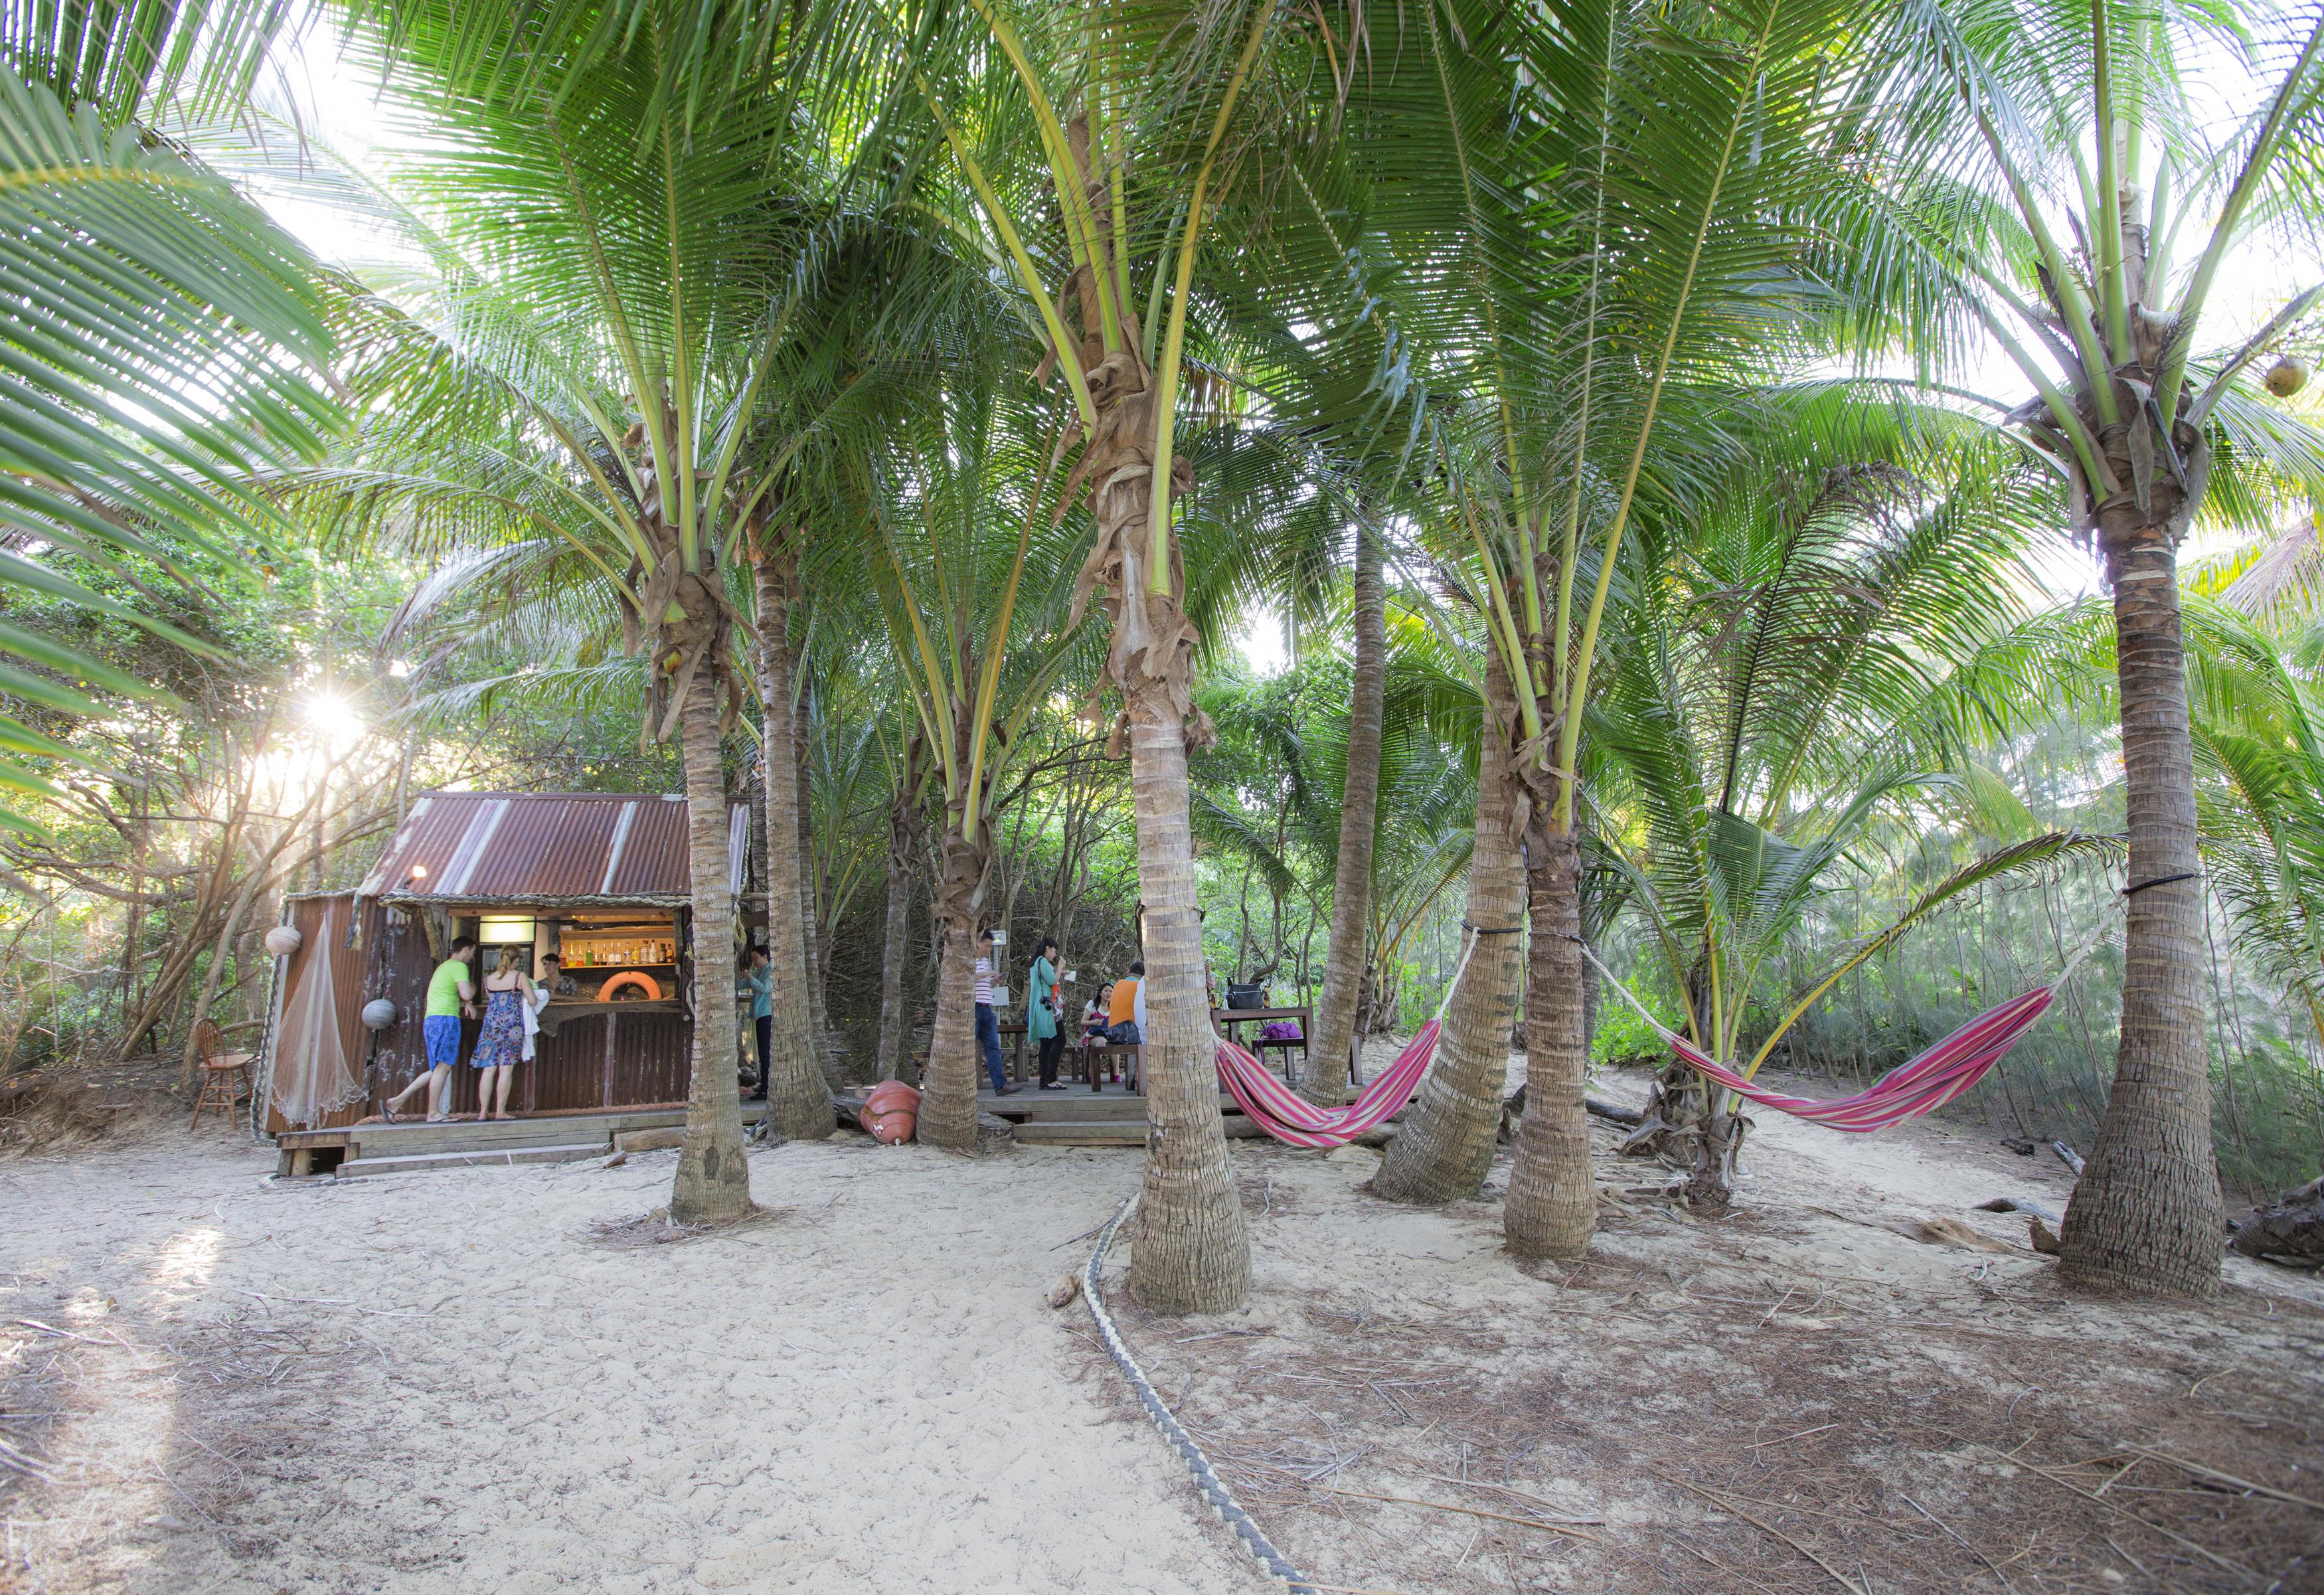 https://www.thalabeach.com.au/wp-content/uploads/2010/07/Thala_Beach_Lodge_0043.jpg